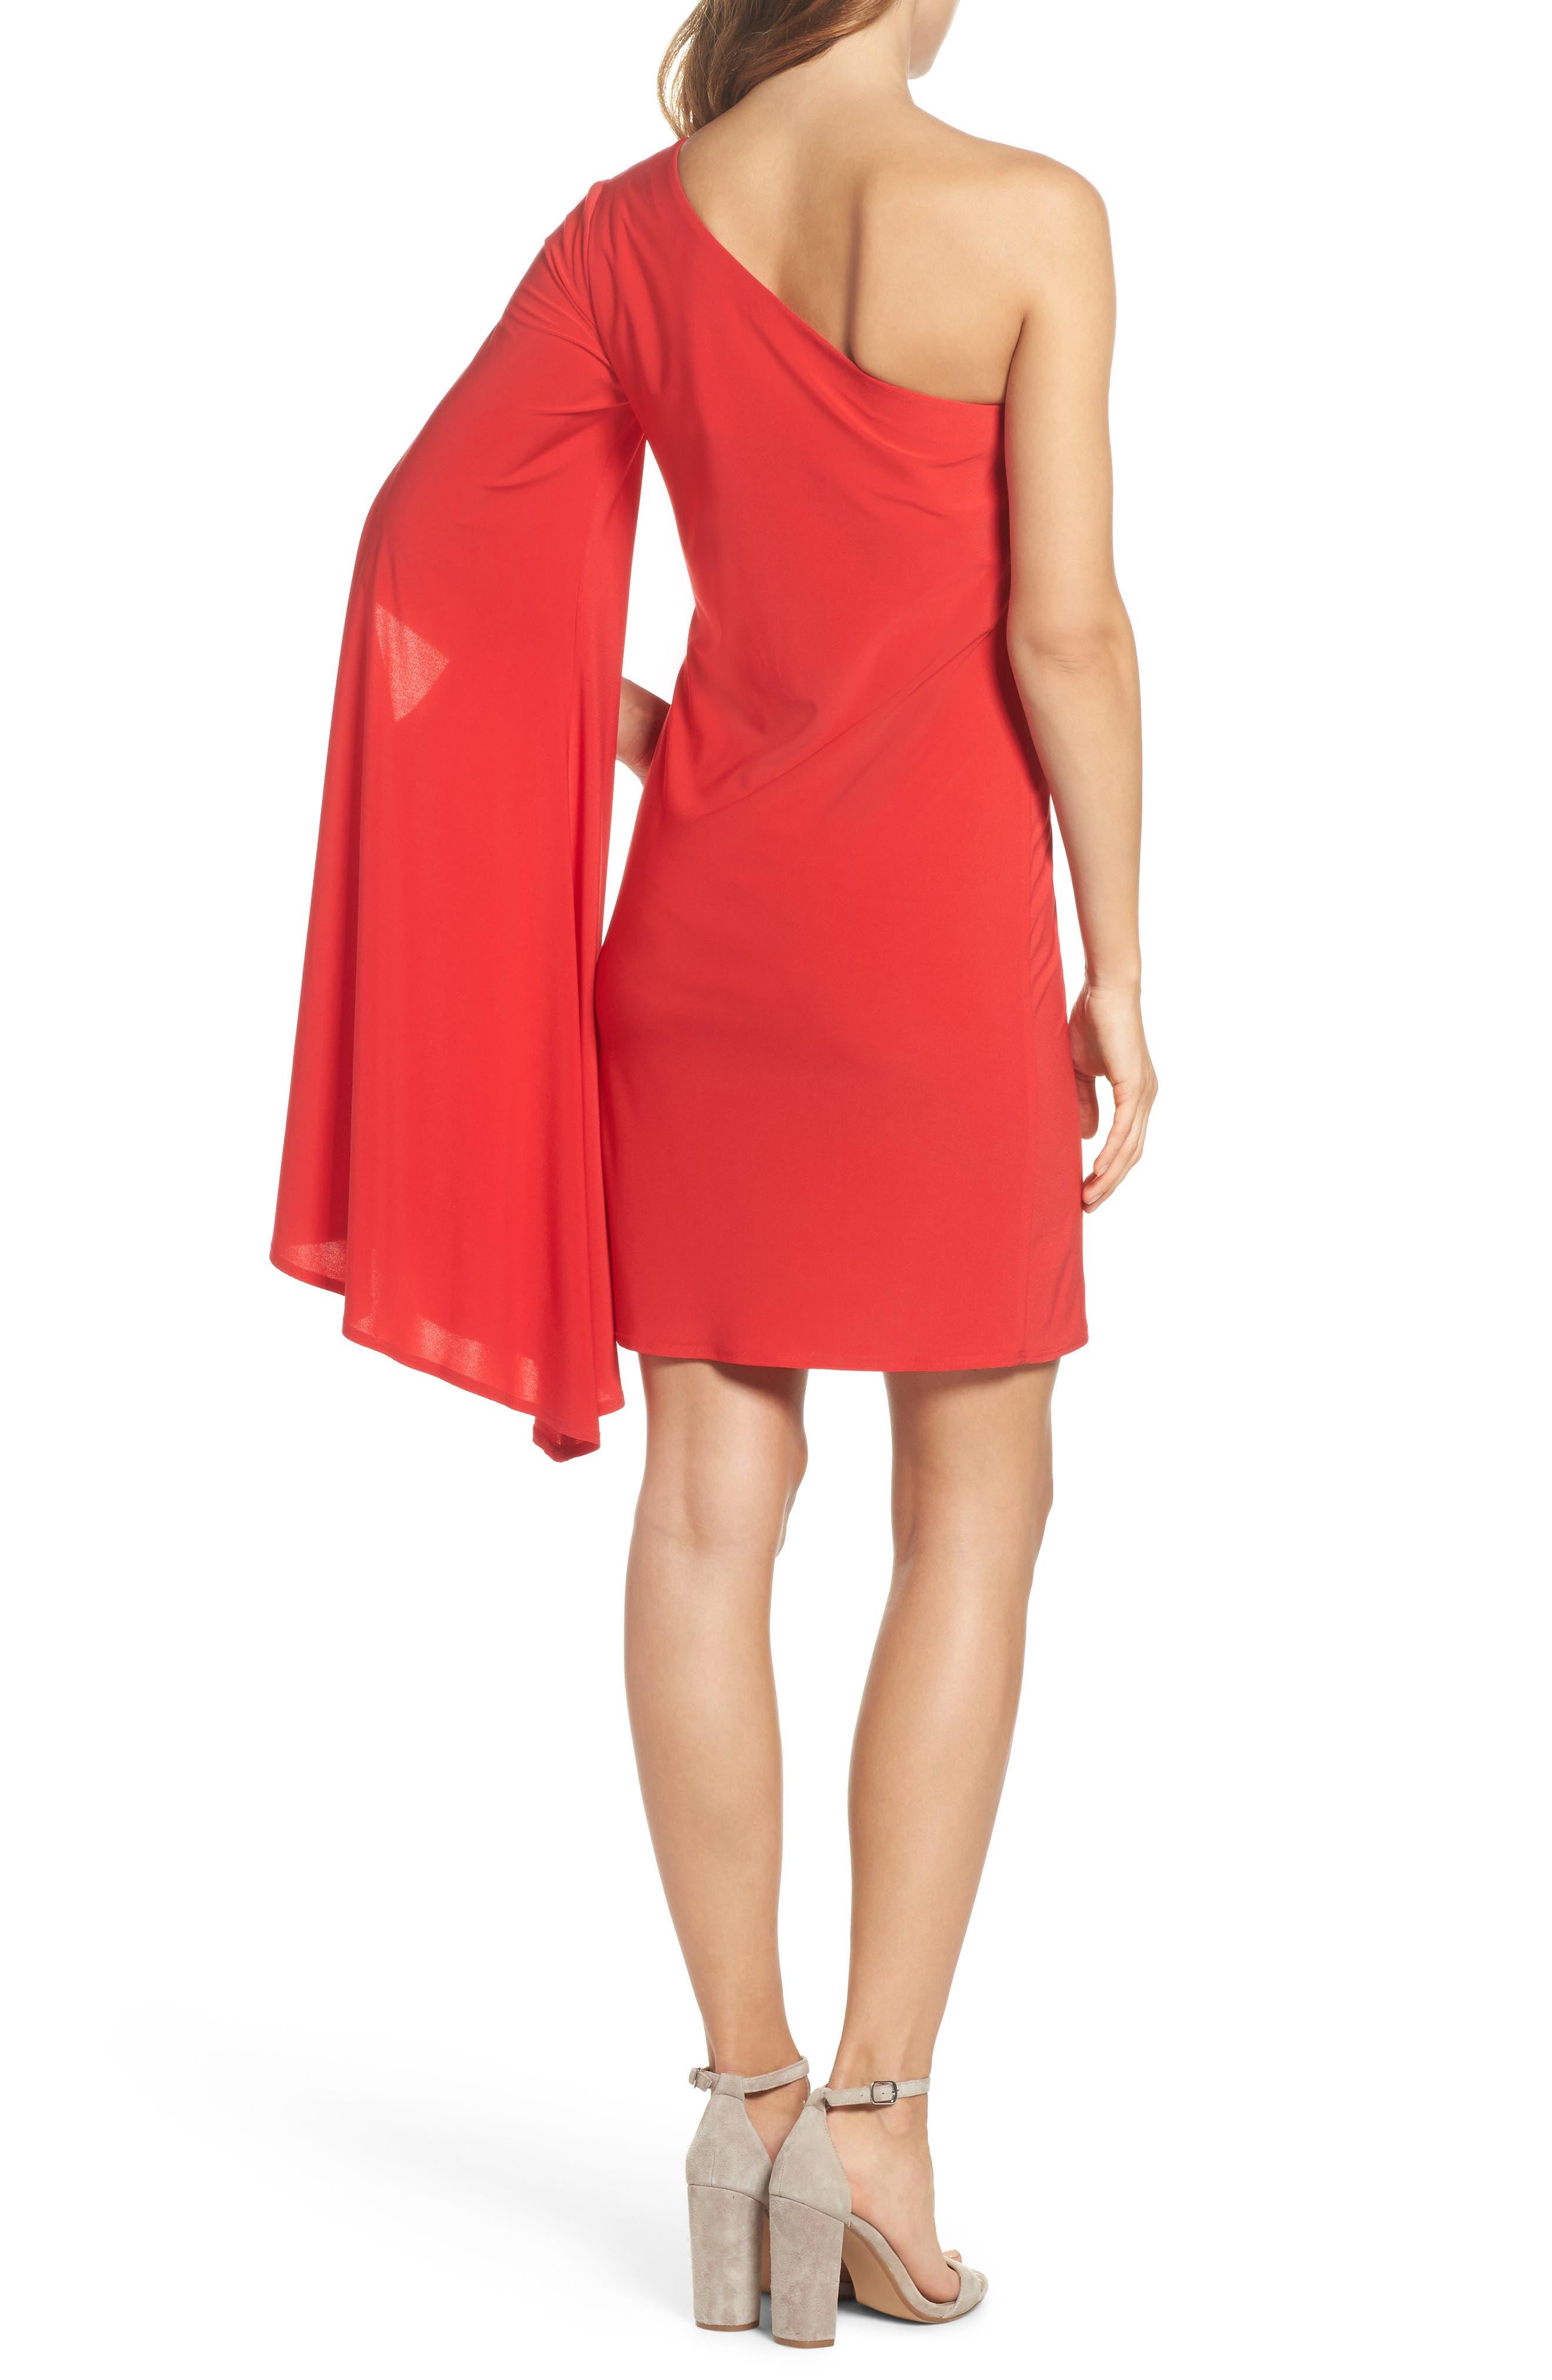 Musa One-Shoulder Dress,                             Alternate thumbnail 2, color,